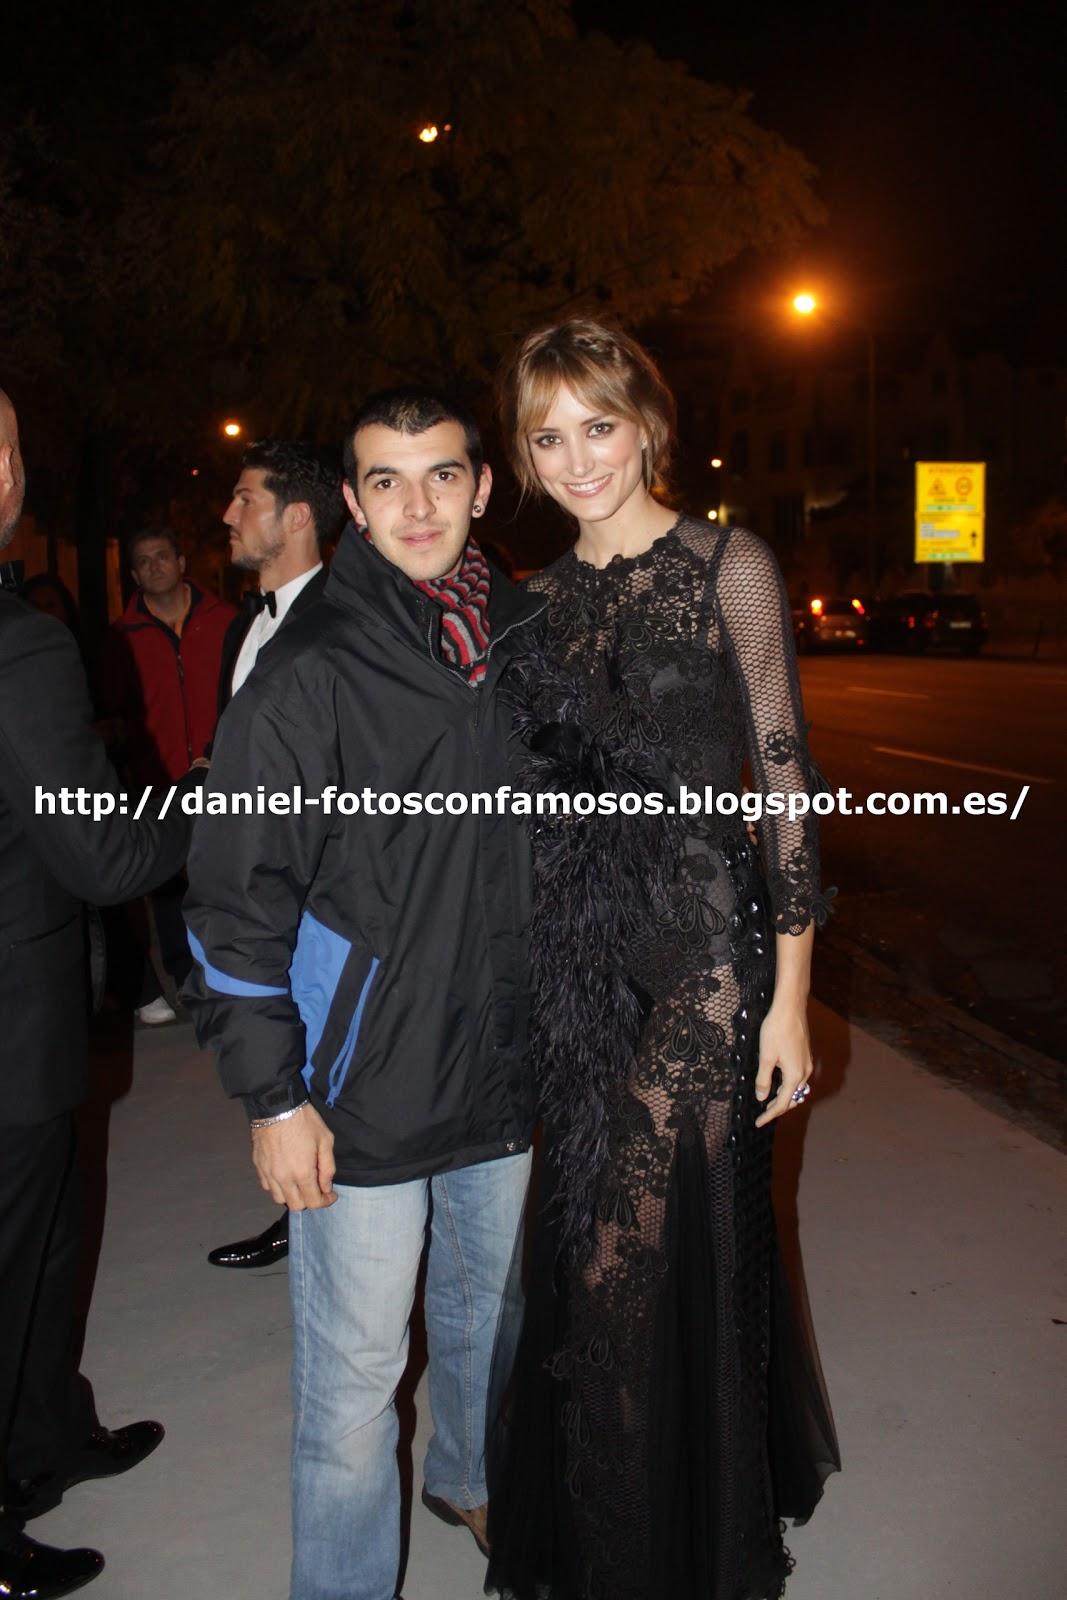 http://4.bp.blogspot.com/-PVwcHU3kTqk/UK-44NV_JTI/AAAAAAAAAFI/wq8743ugzQA/s1600/Alba+Carrillo.jpg